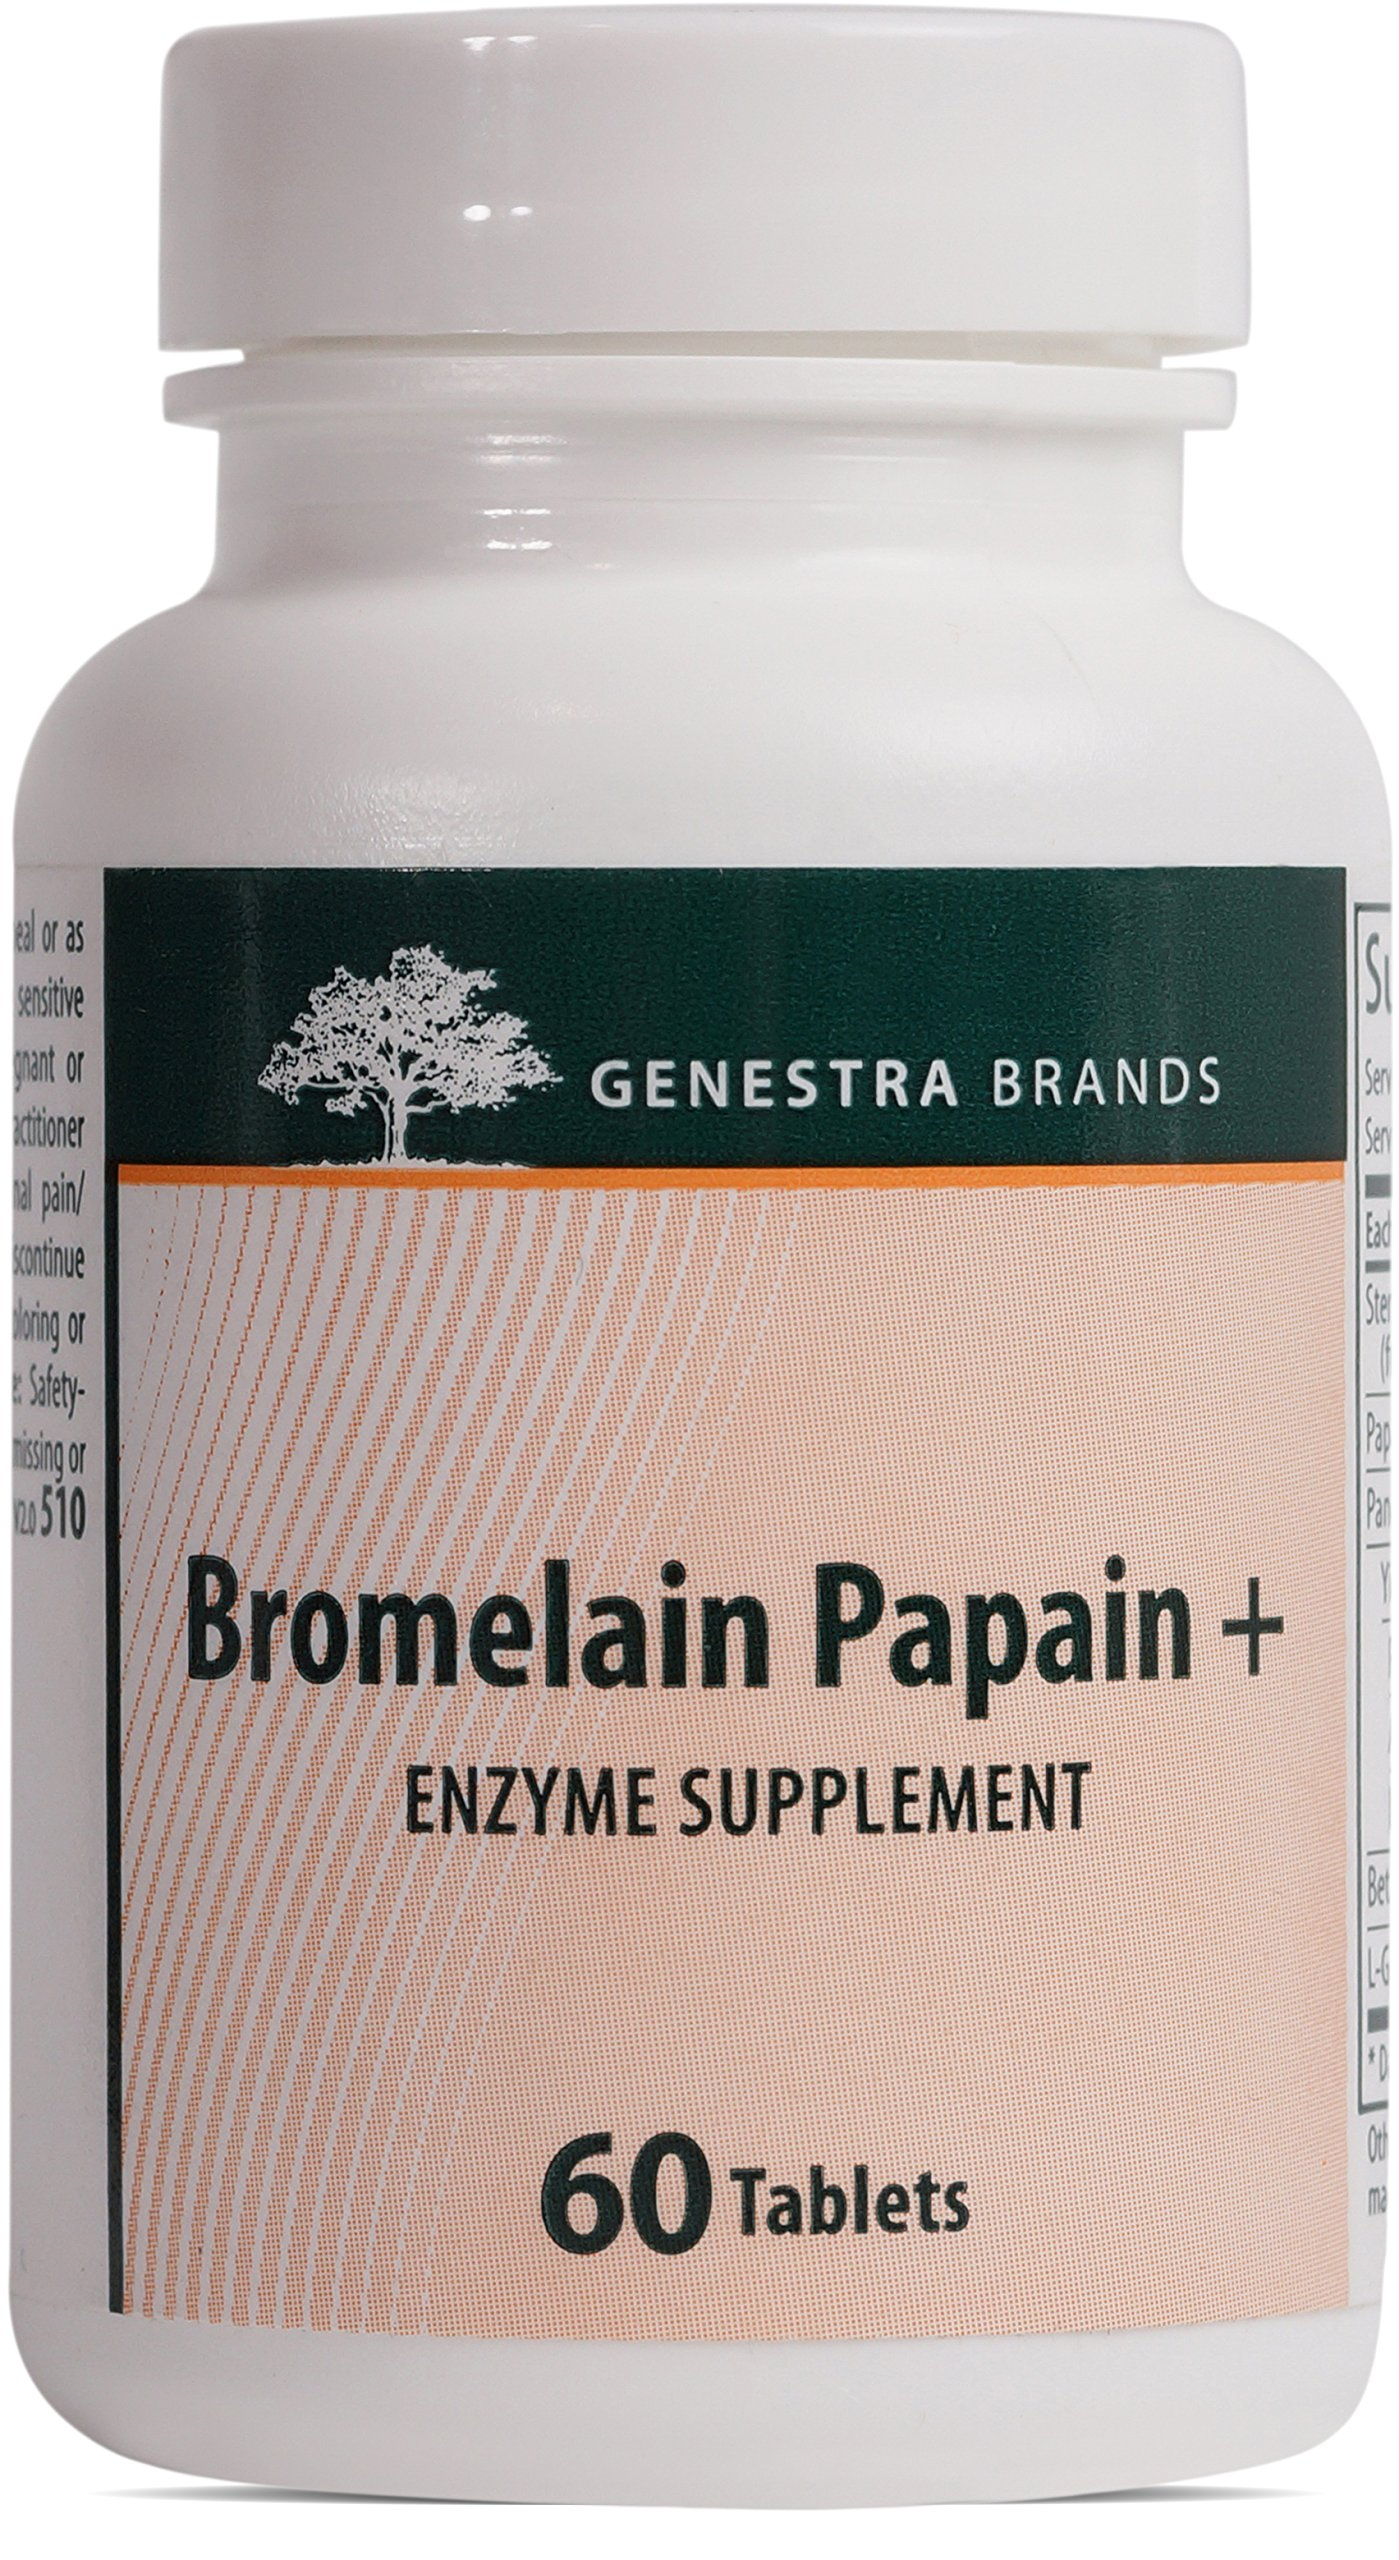 Genestra Brands - Bromelain Papain+ - Multi Enzymatic Formulation in Tablet Format - 60 Tablets